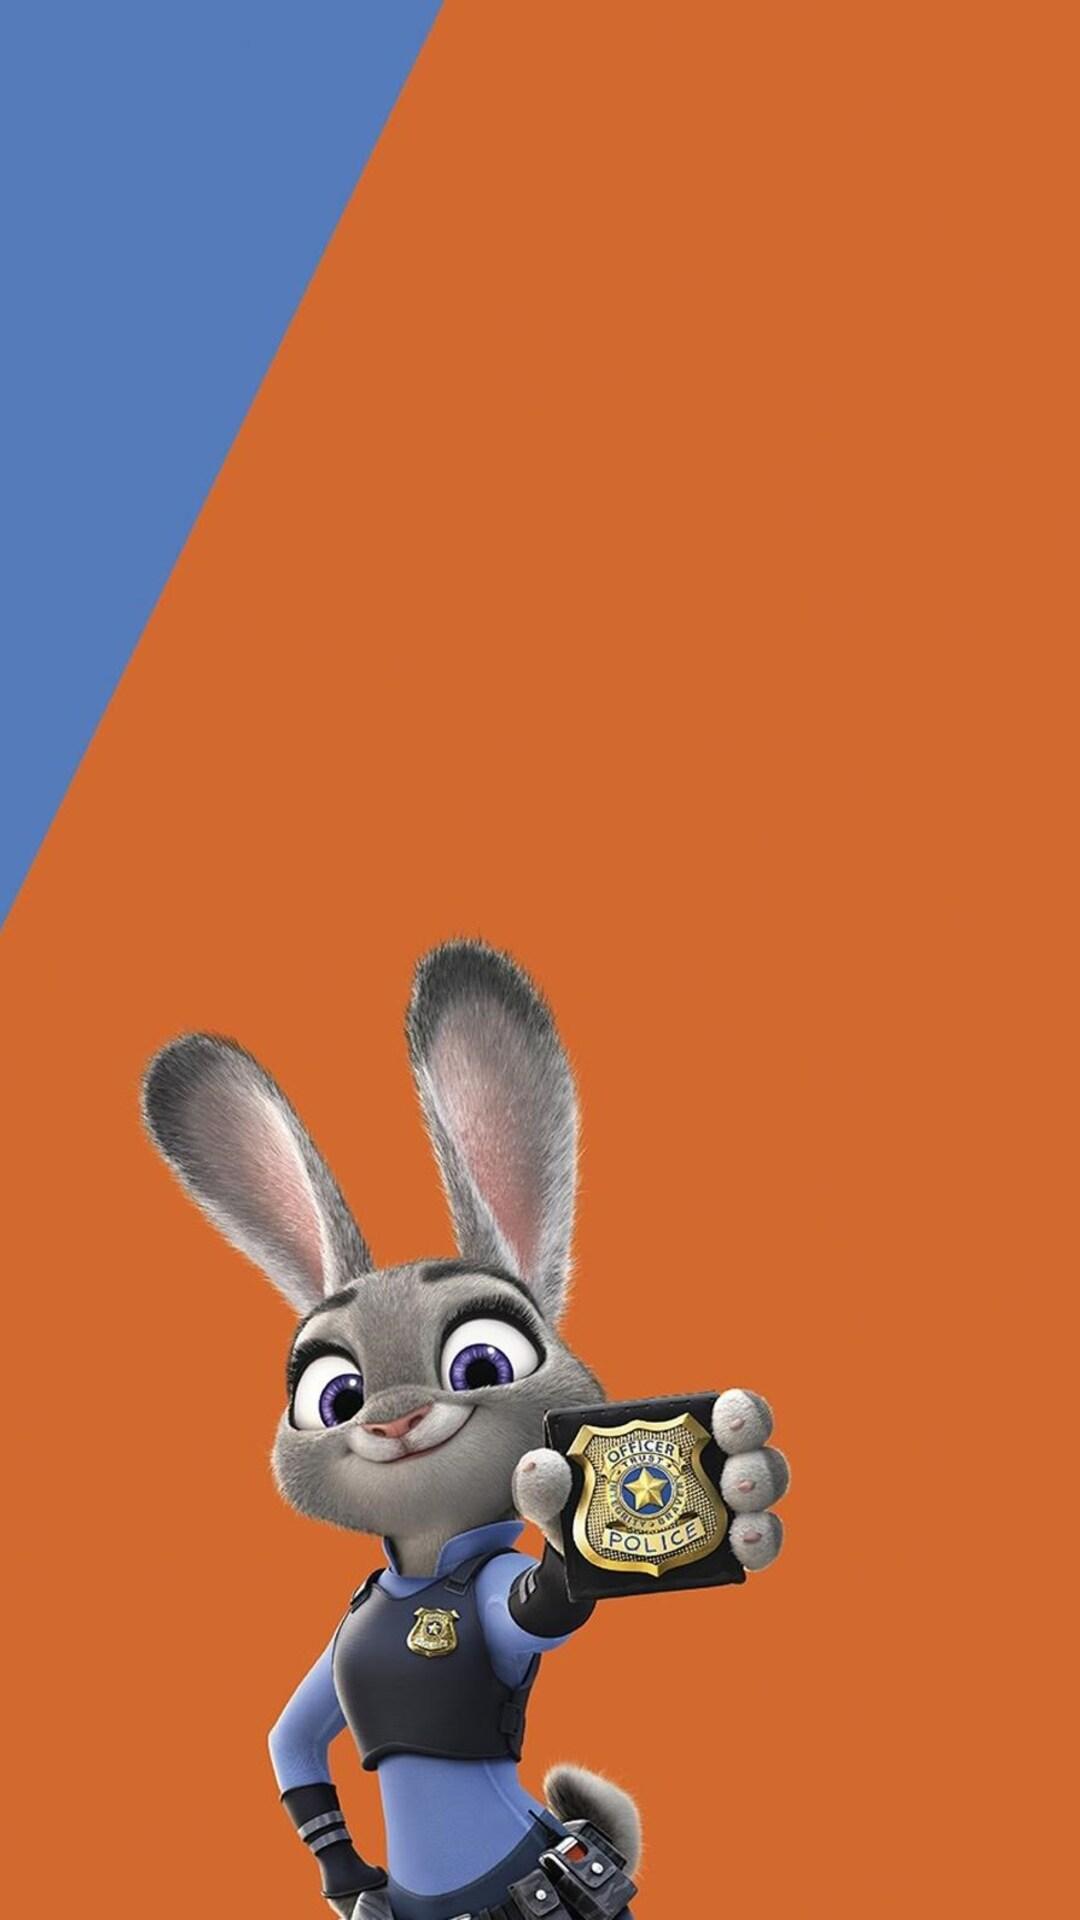 judy-hopps-and-nick-zootopia.jpg